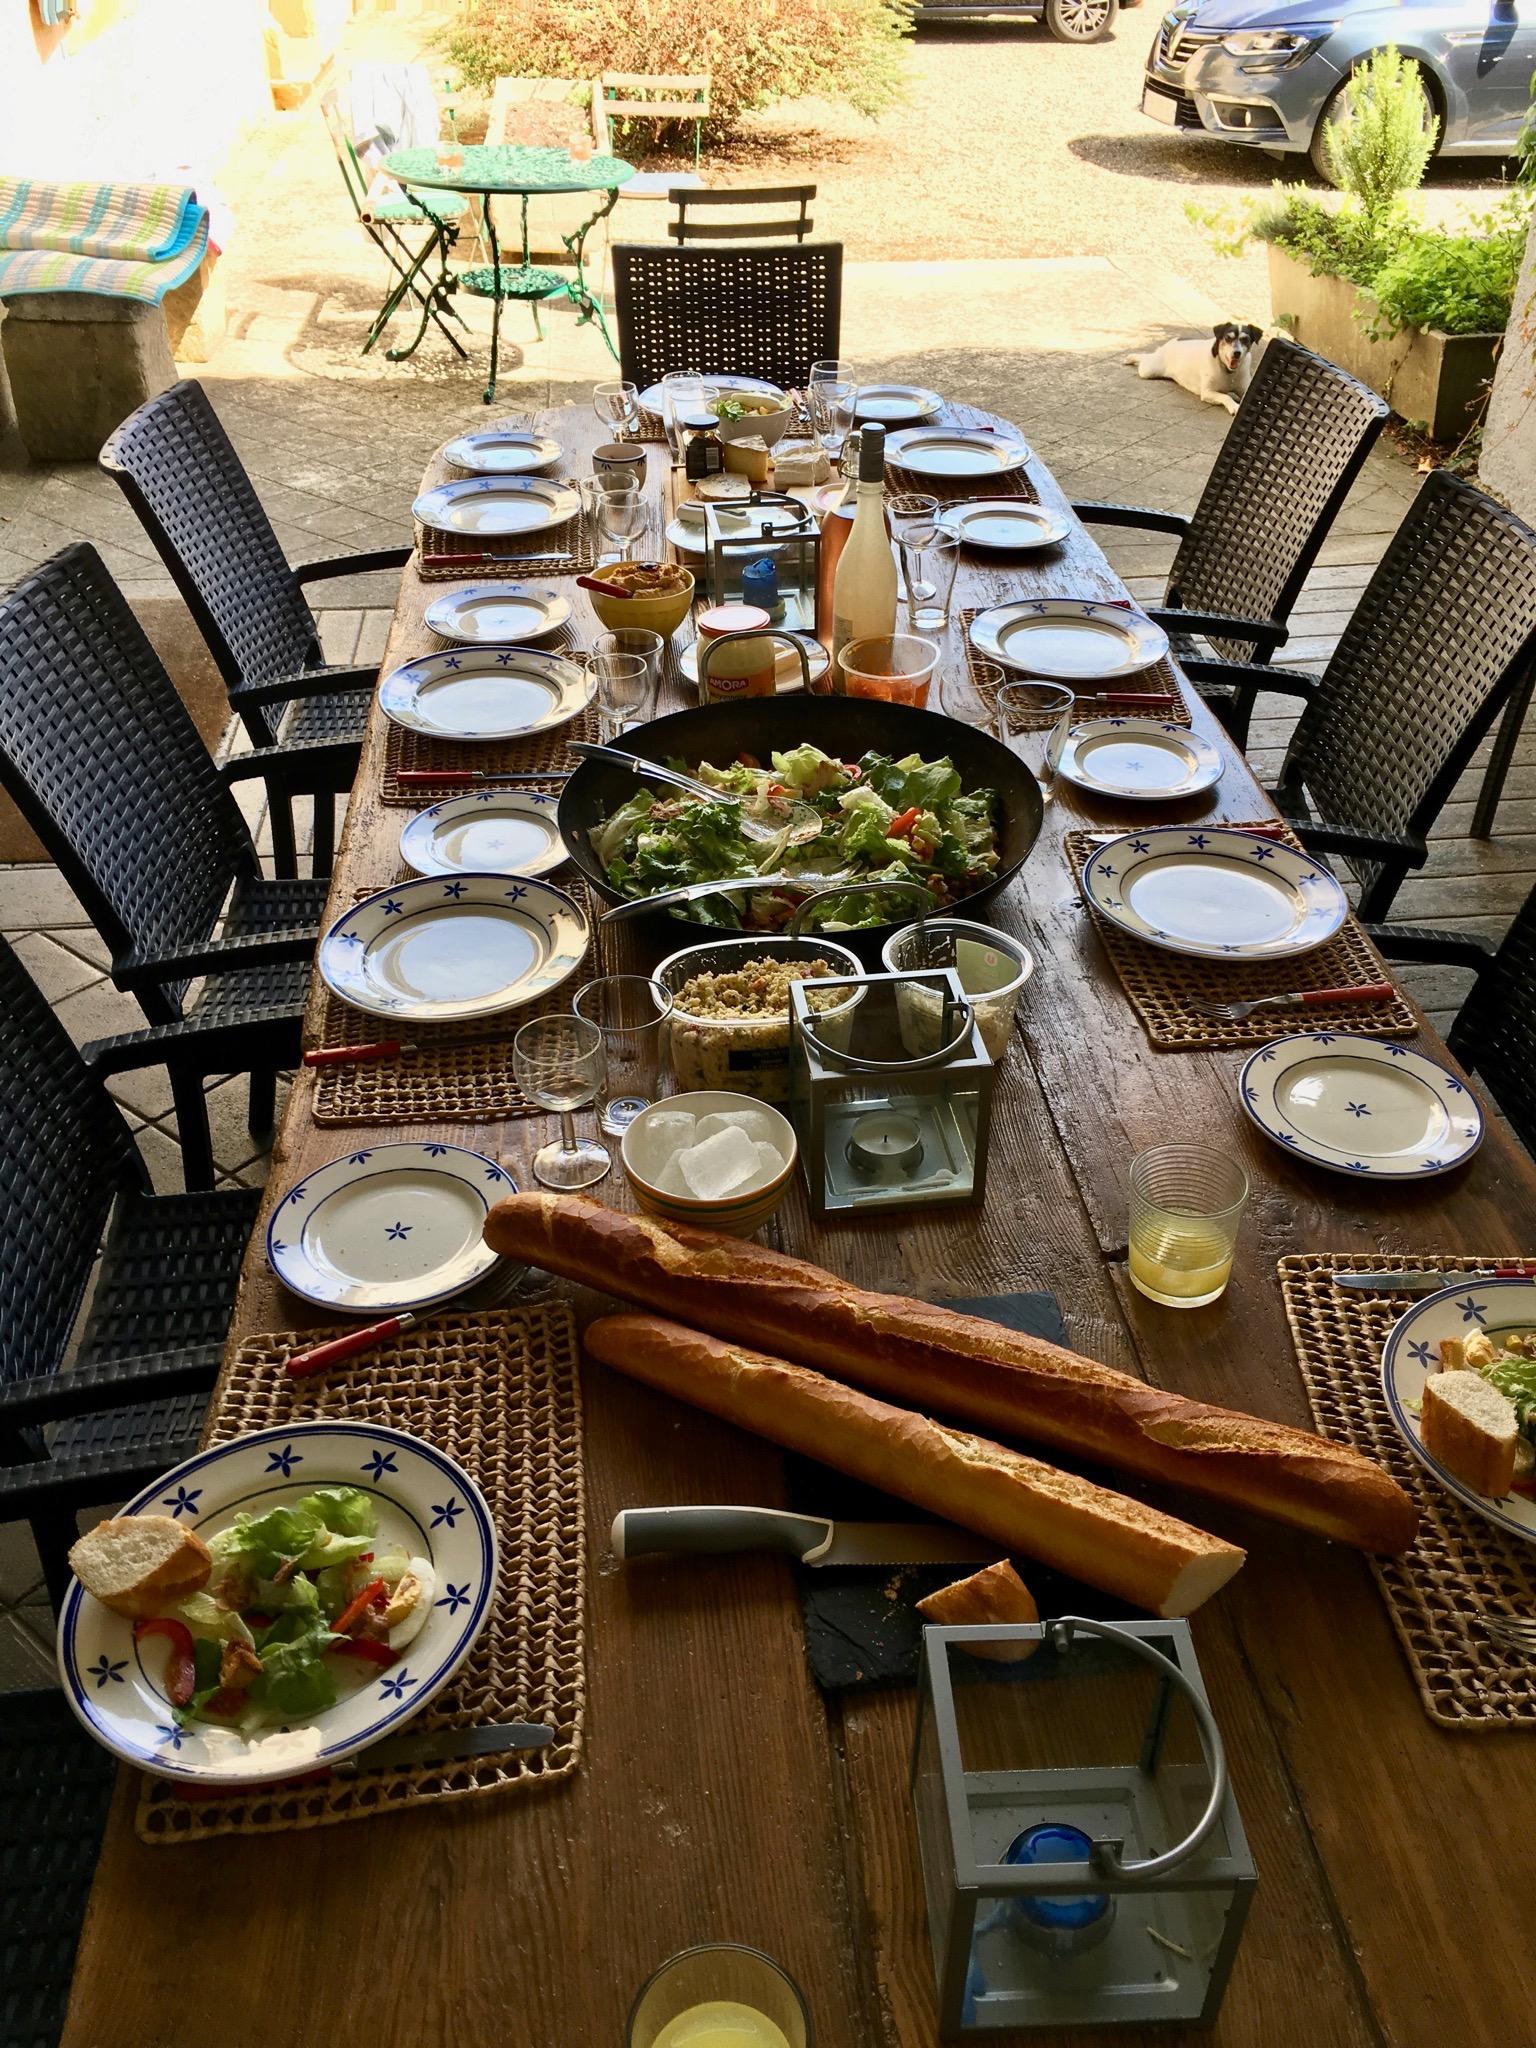 Summer Lunch Outdoor | Domaine du Pignoulet, Gascony, France